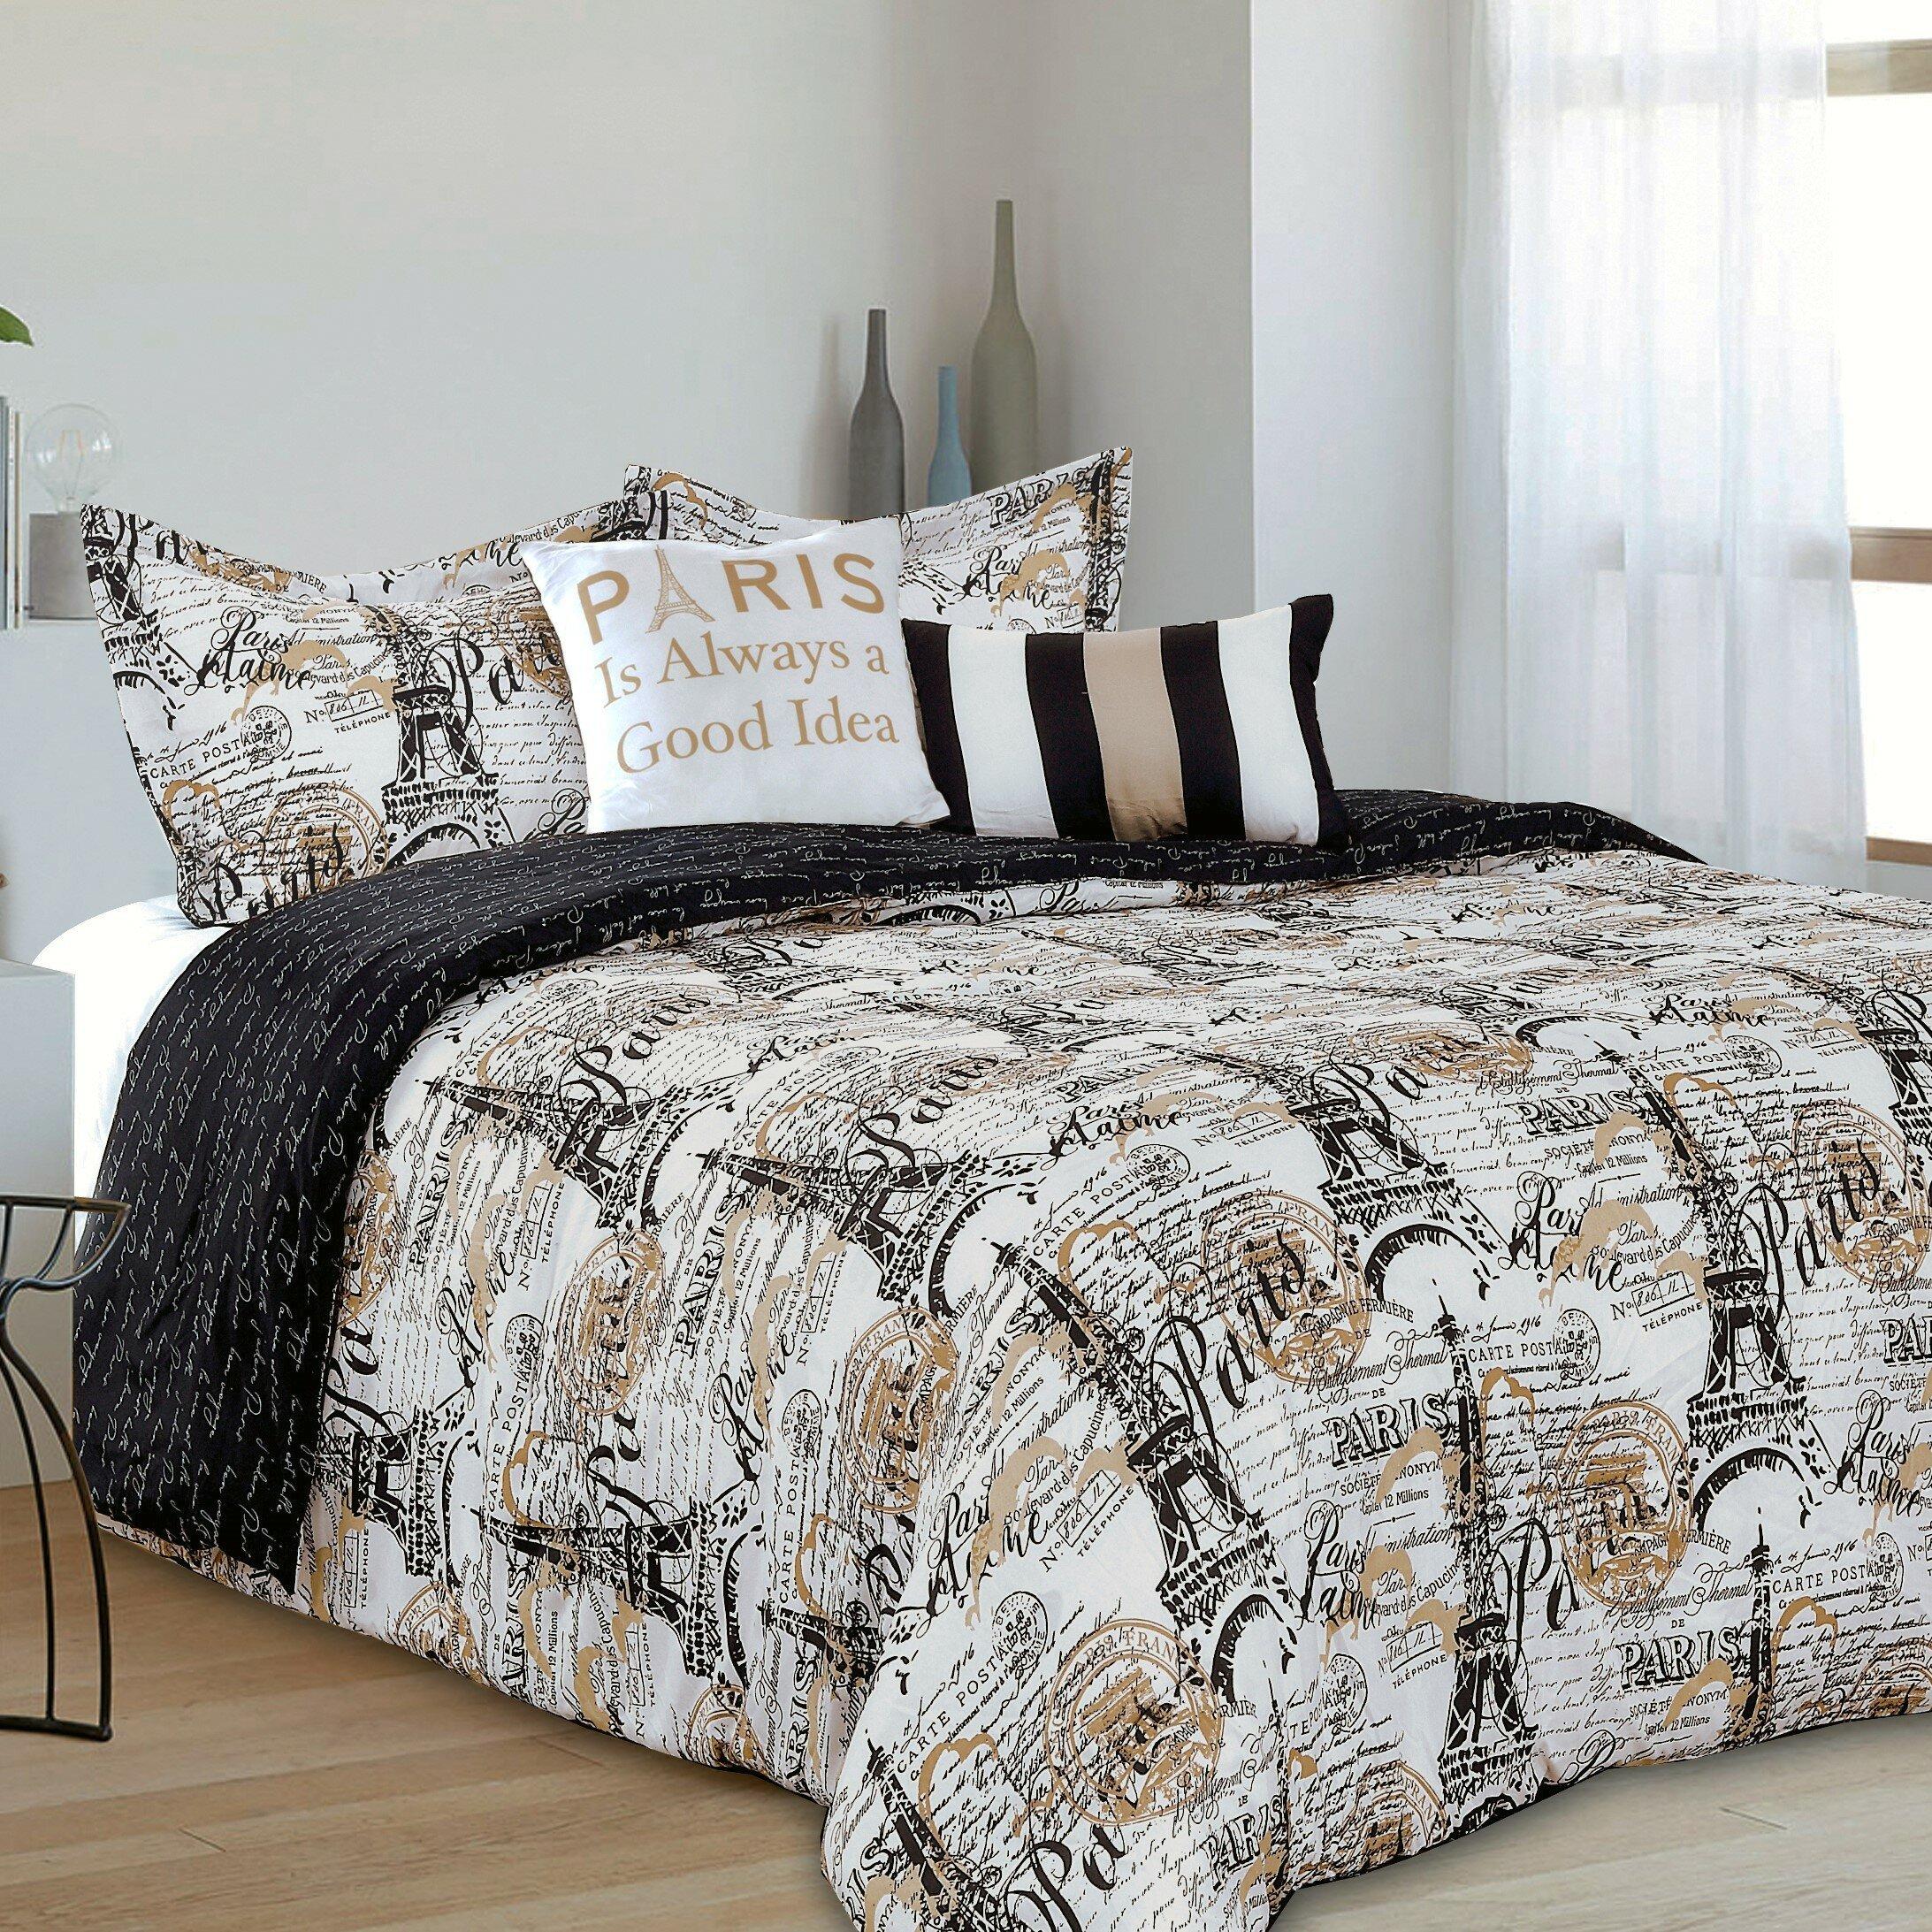 Kathy Ireland Bedroom Furniture Beautiful House Of Hampton Edwardo Chic Paris Reversible forter Set